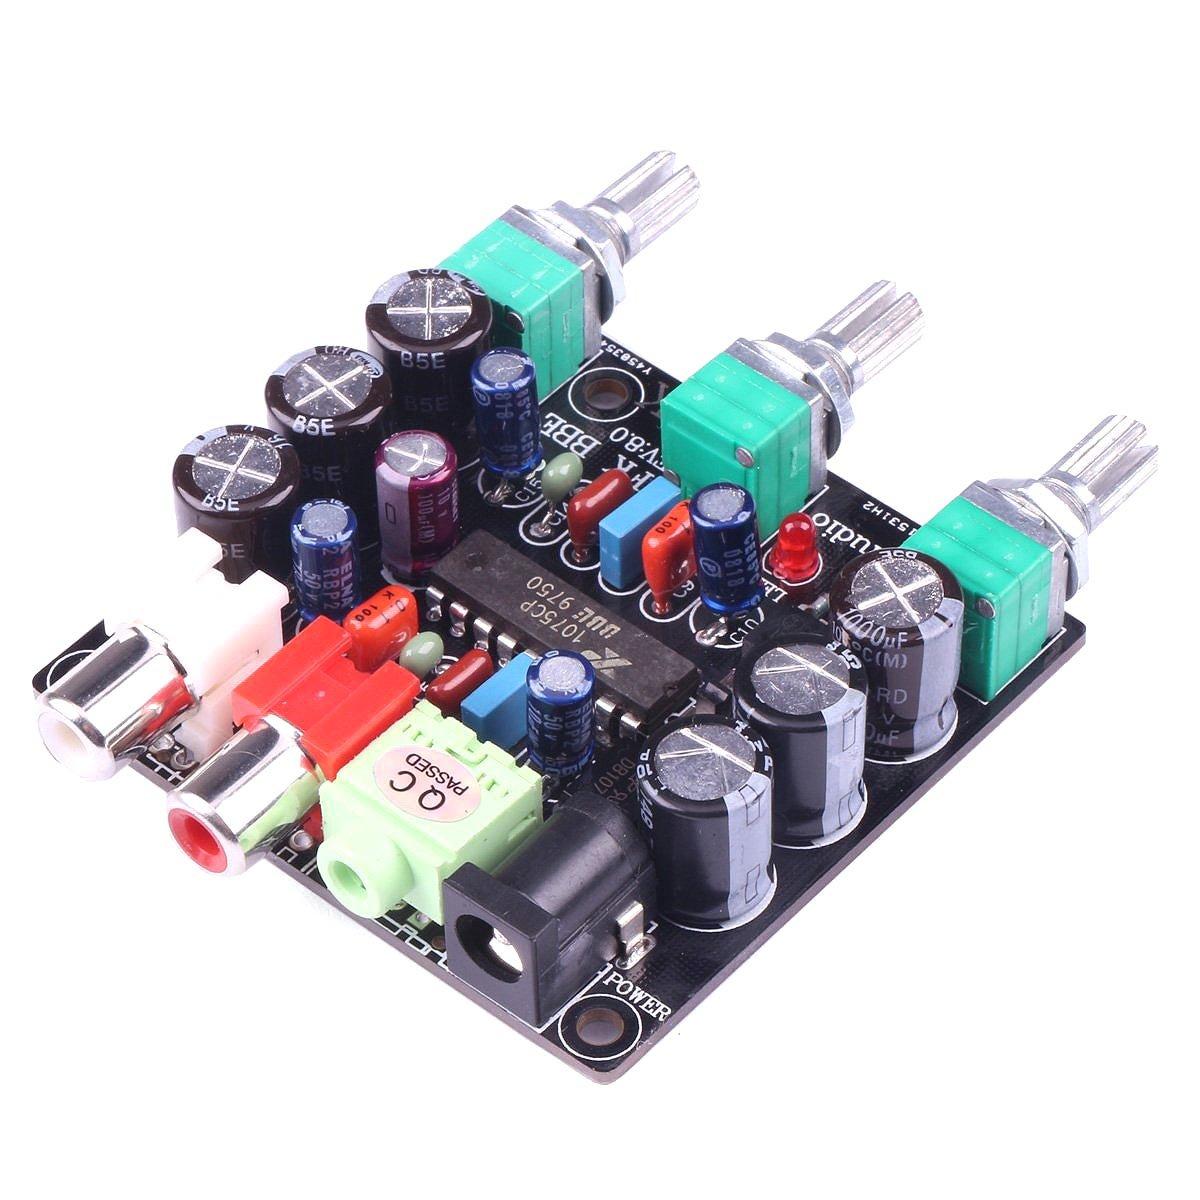 DollaTek Módulo de Ajuste Mini XR1075 BBE Tono CC 10-26V / 9-20V AC Fuente de alimentación de Graves/Agudos / Control de Volumen de 2 Canales para CDs ...